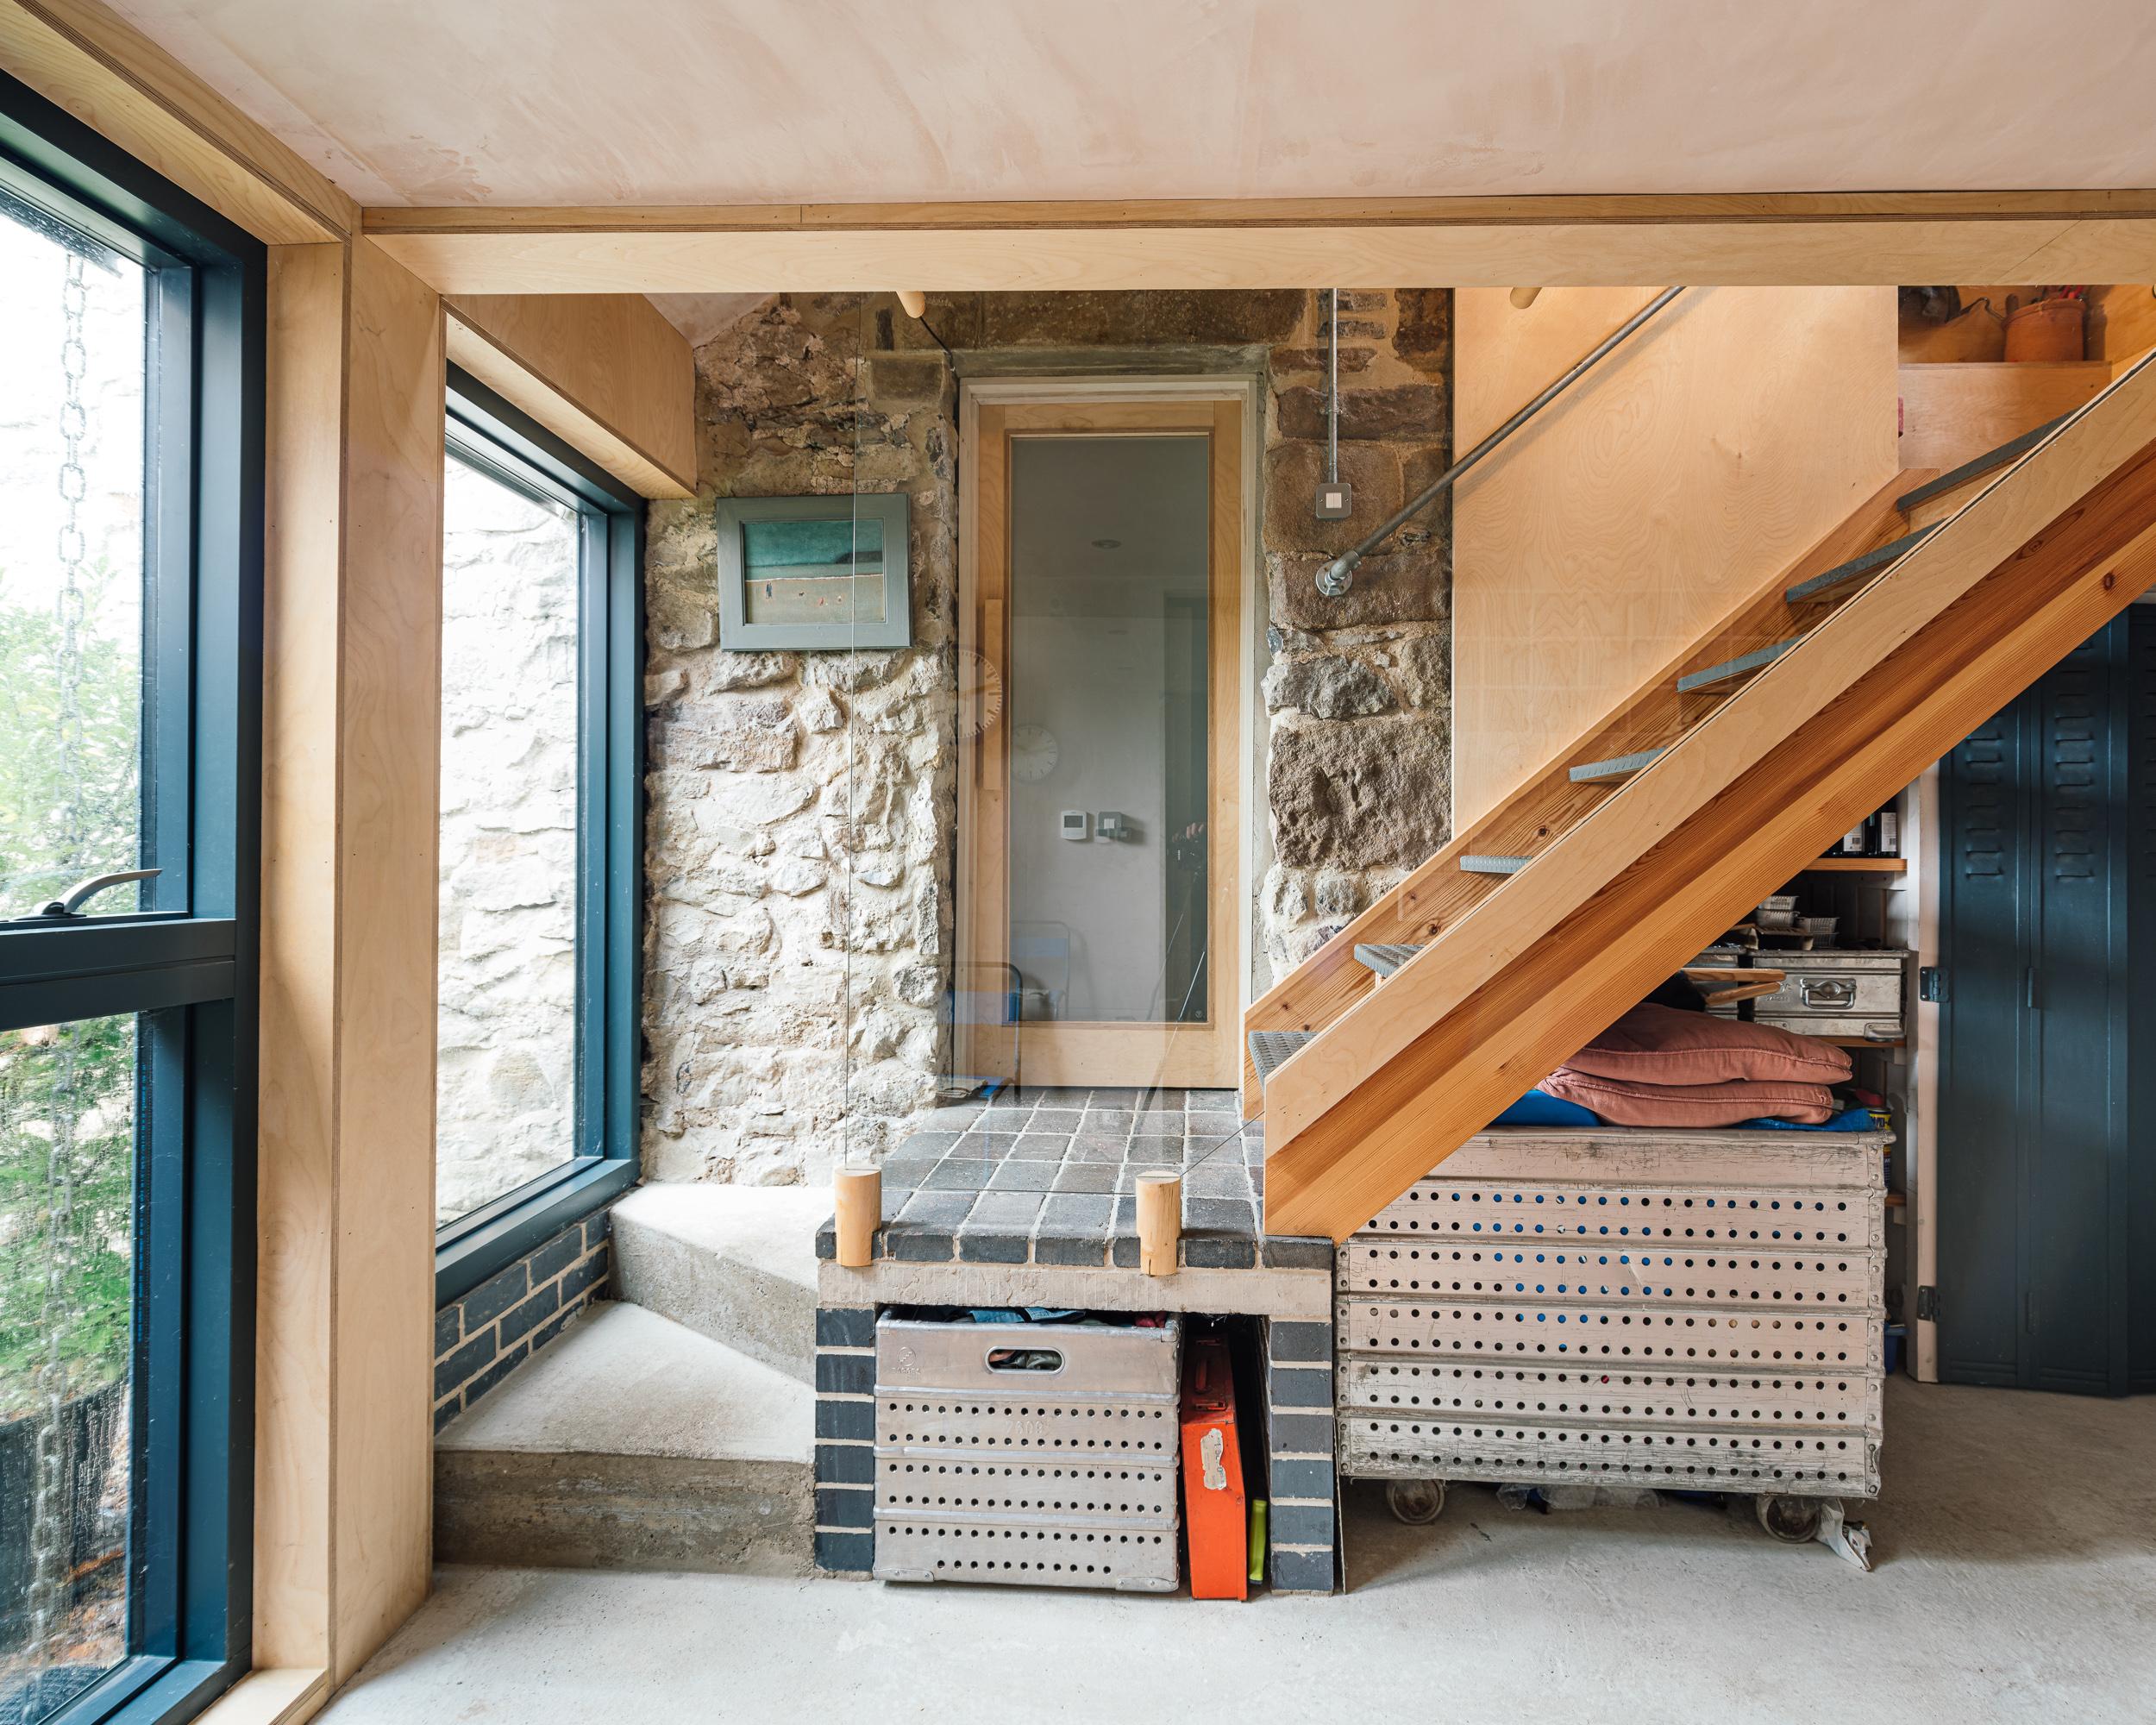 Concrete, blue brick, metal stair case